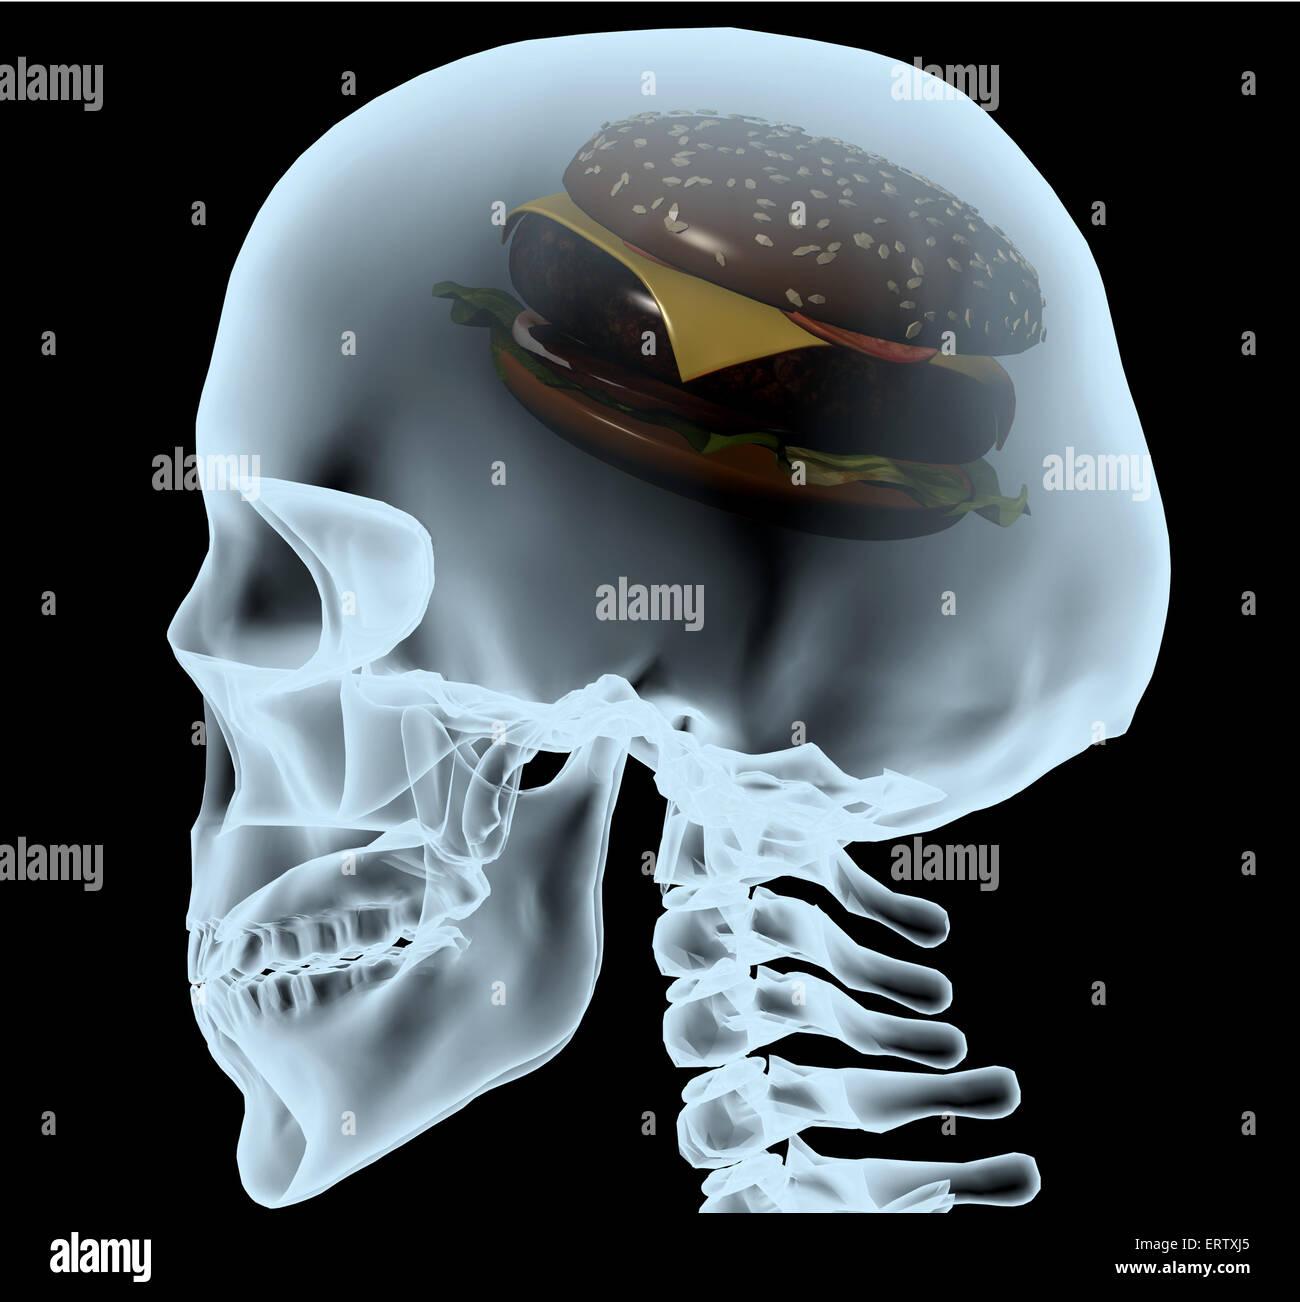 Röntgen des Kopfes mit dem Burger statt des Gehirns, 3d illustration Stockbild